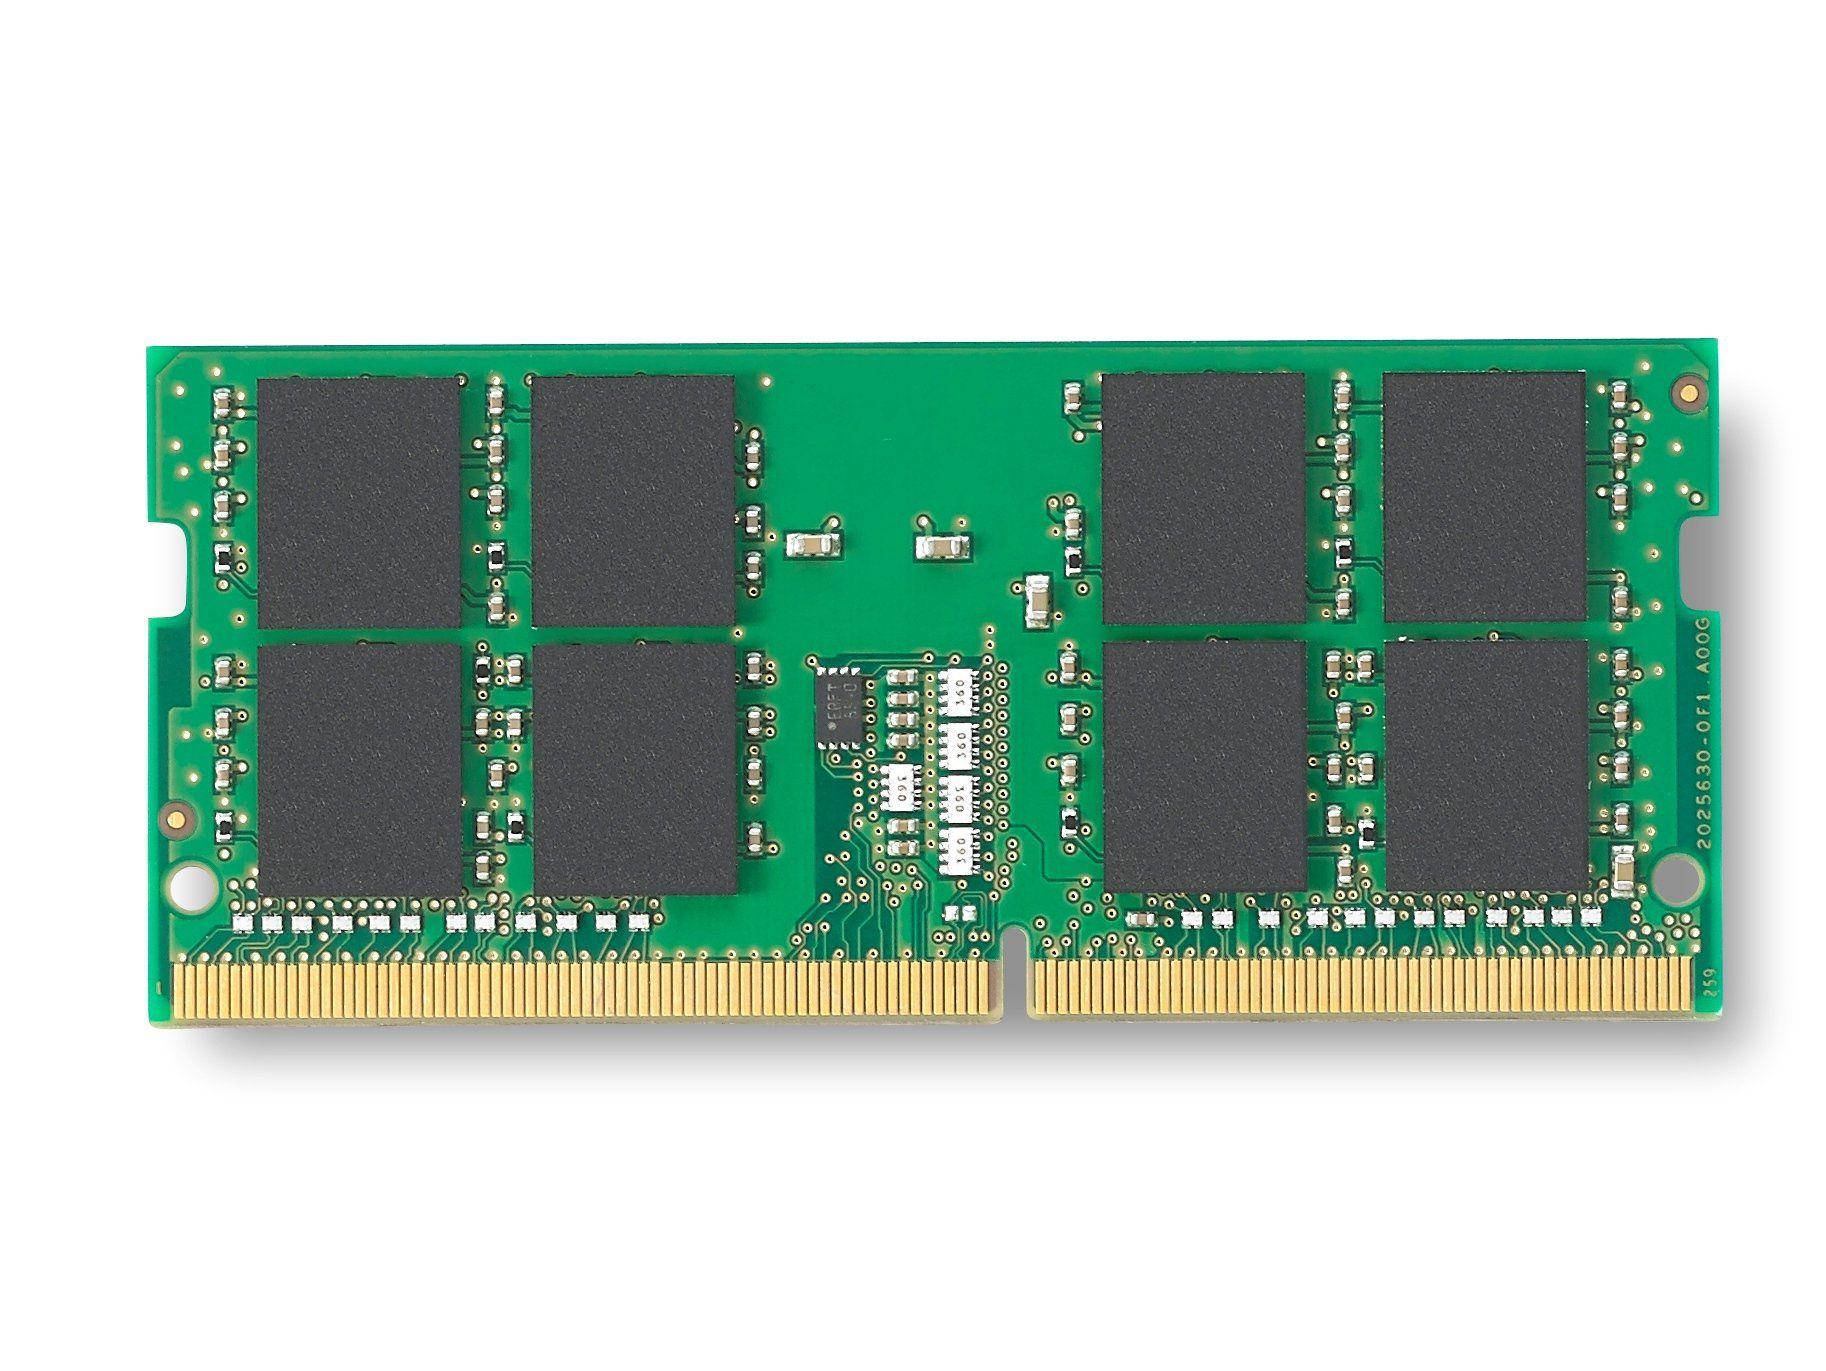 Memória de 16GB SODIMM DDR4 2400Mhz 1,2V 2Rx8 para notebook -KVR24S17D8/16